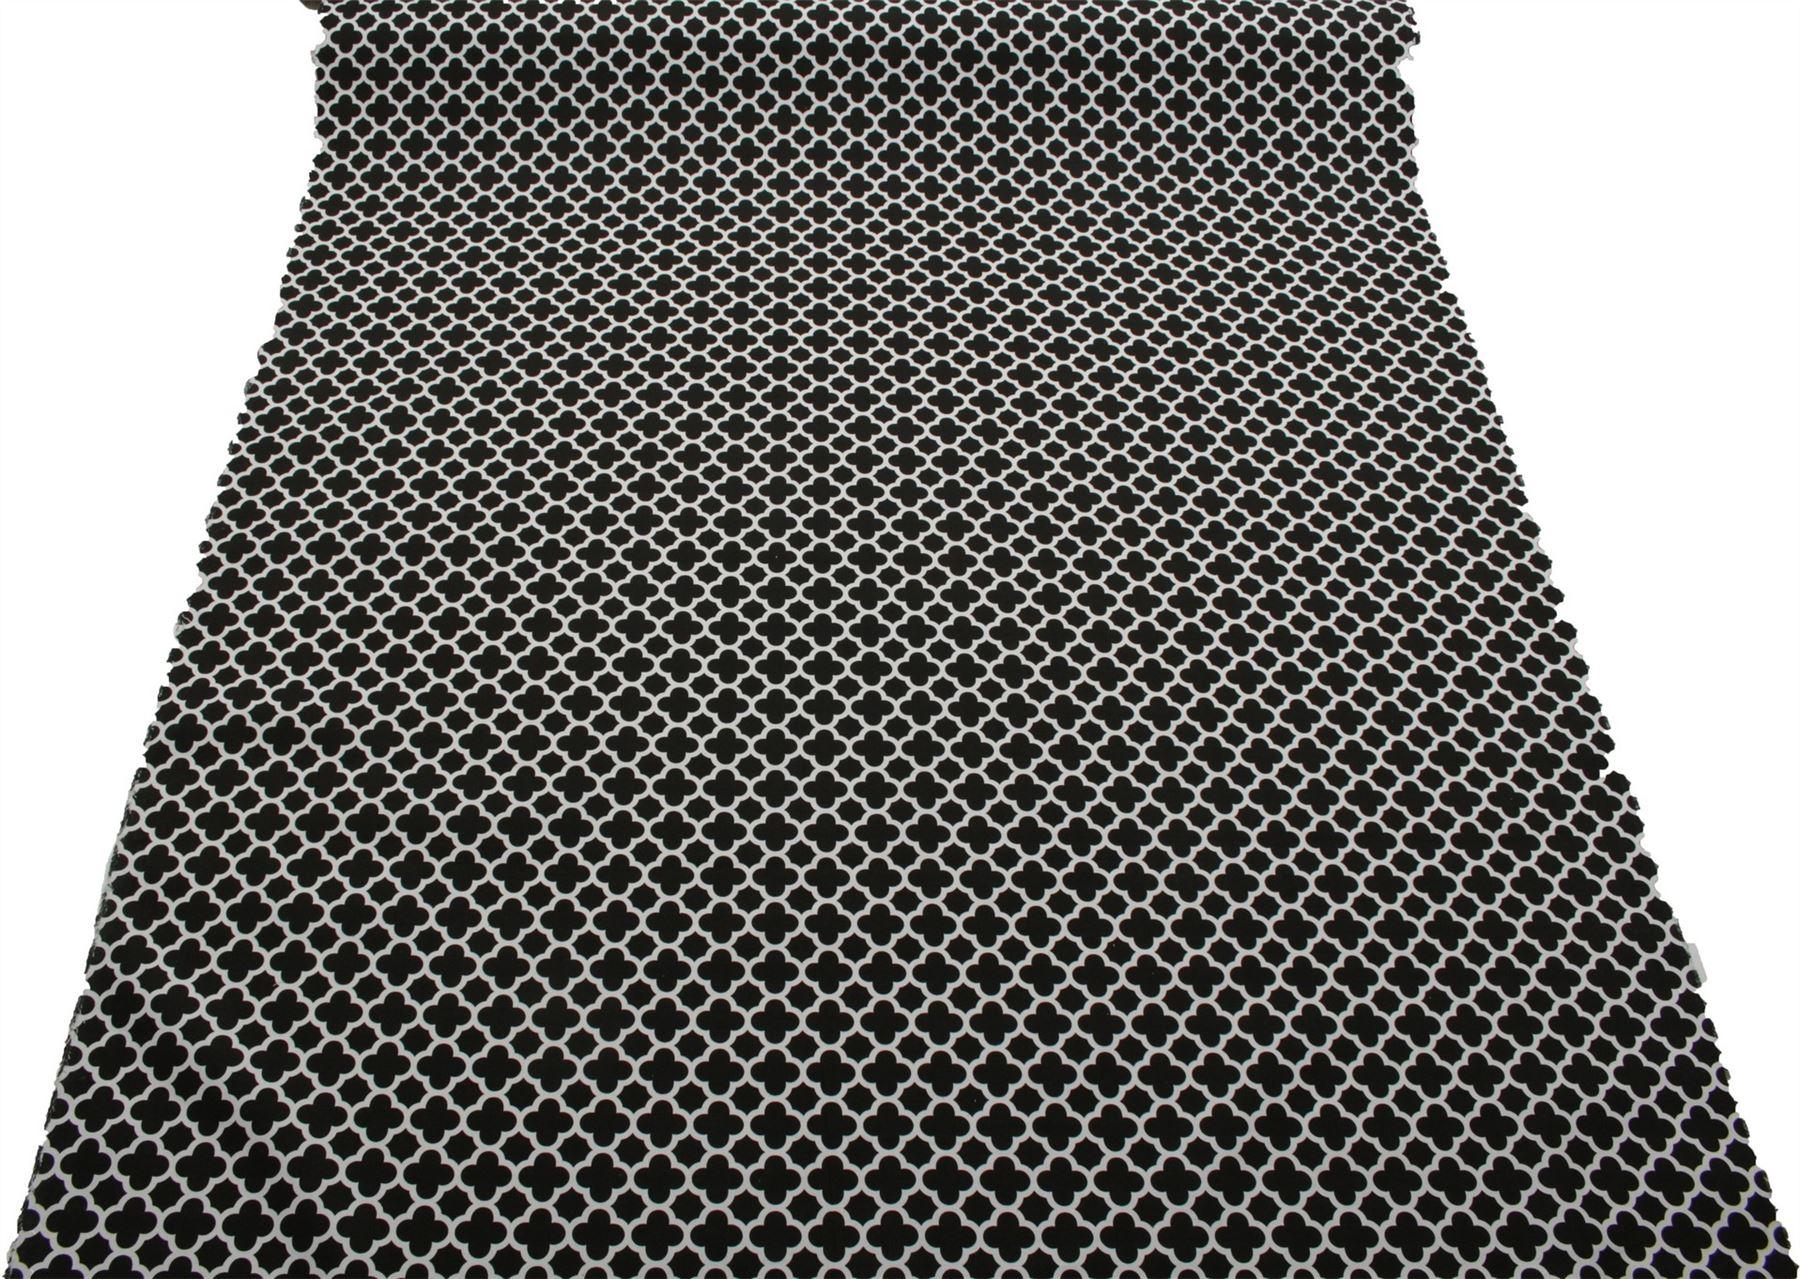 thumbnail 27 - 100% Heavy Cotton Panama Printed Childrens Curtain Cushion Upholstery Fabric